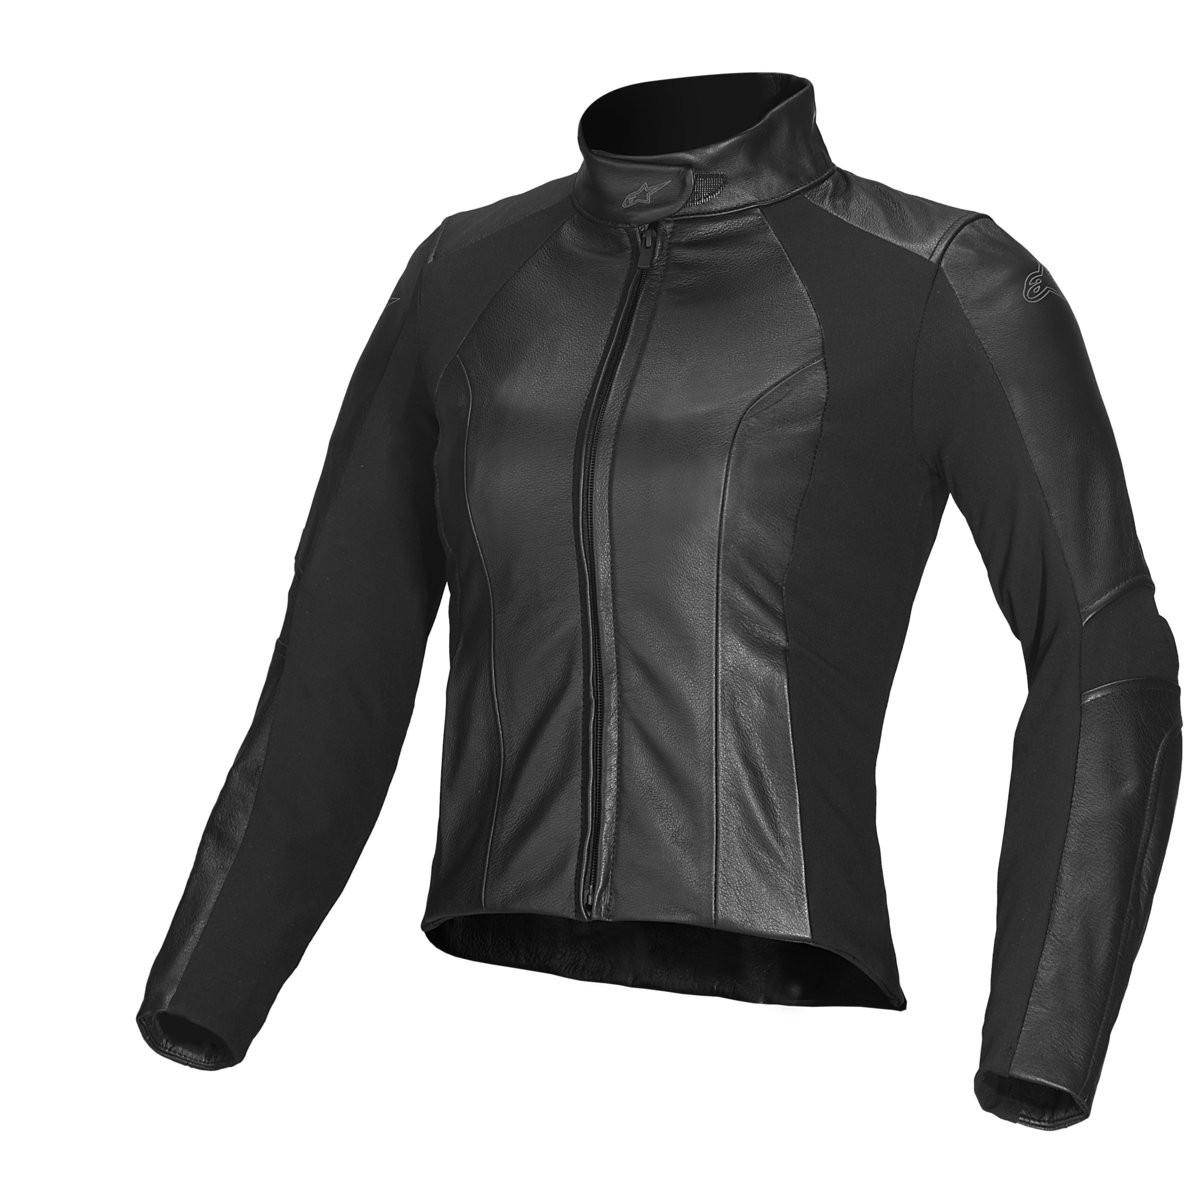 Alpinestars womens leather jacket